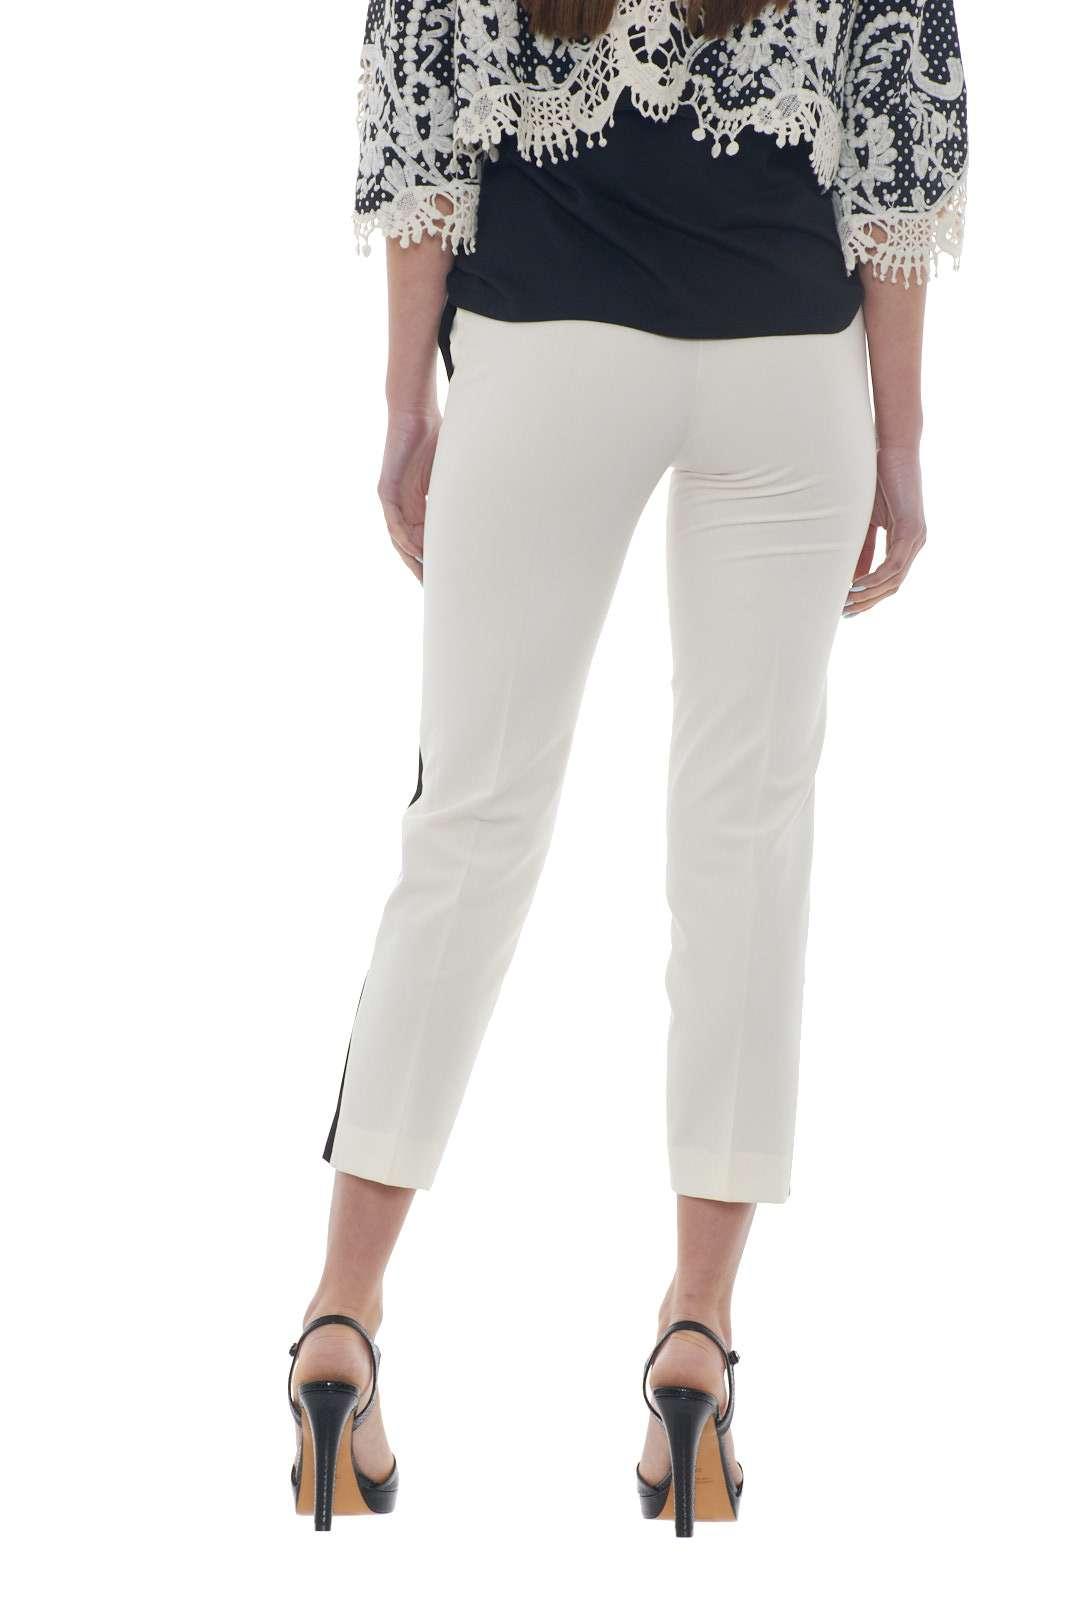 https://www.parmax.com/media/catalog/product/a/i/PE-outlet_parmax-pantaloni-donna-Ekl%C3%A8-1015827-C.jpg